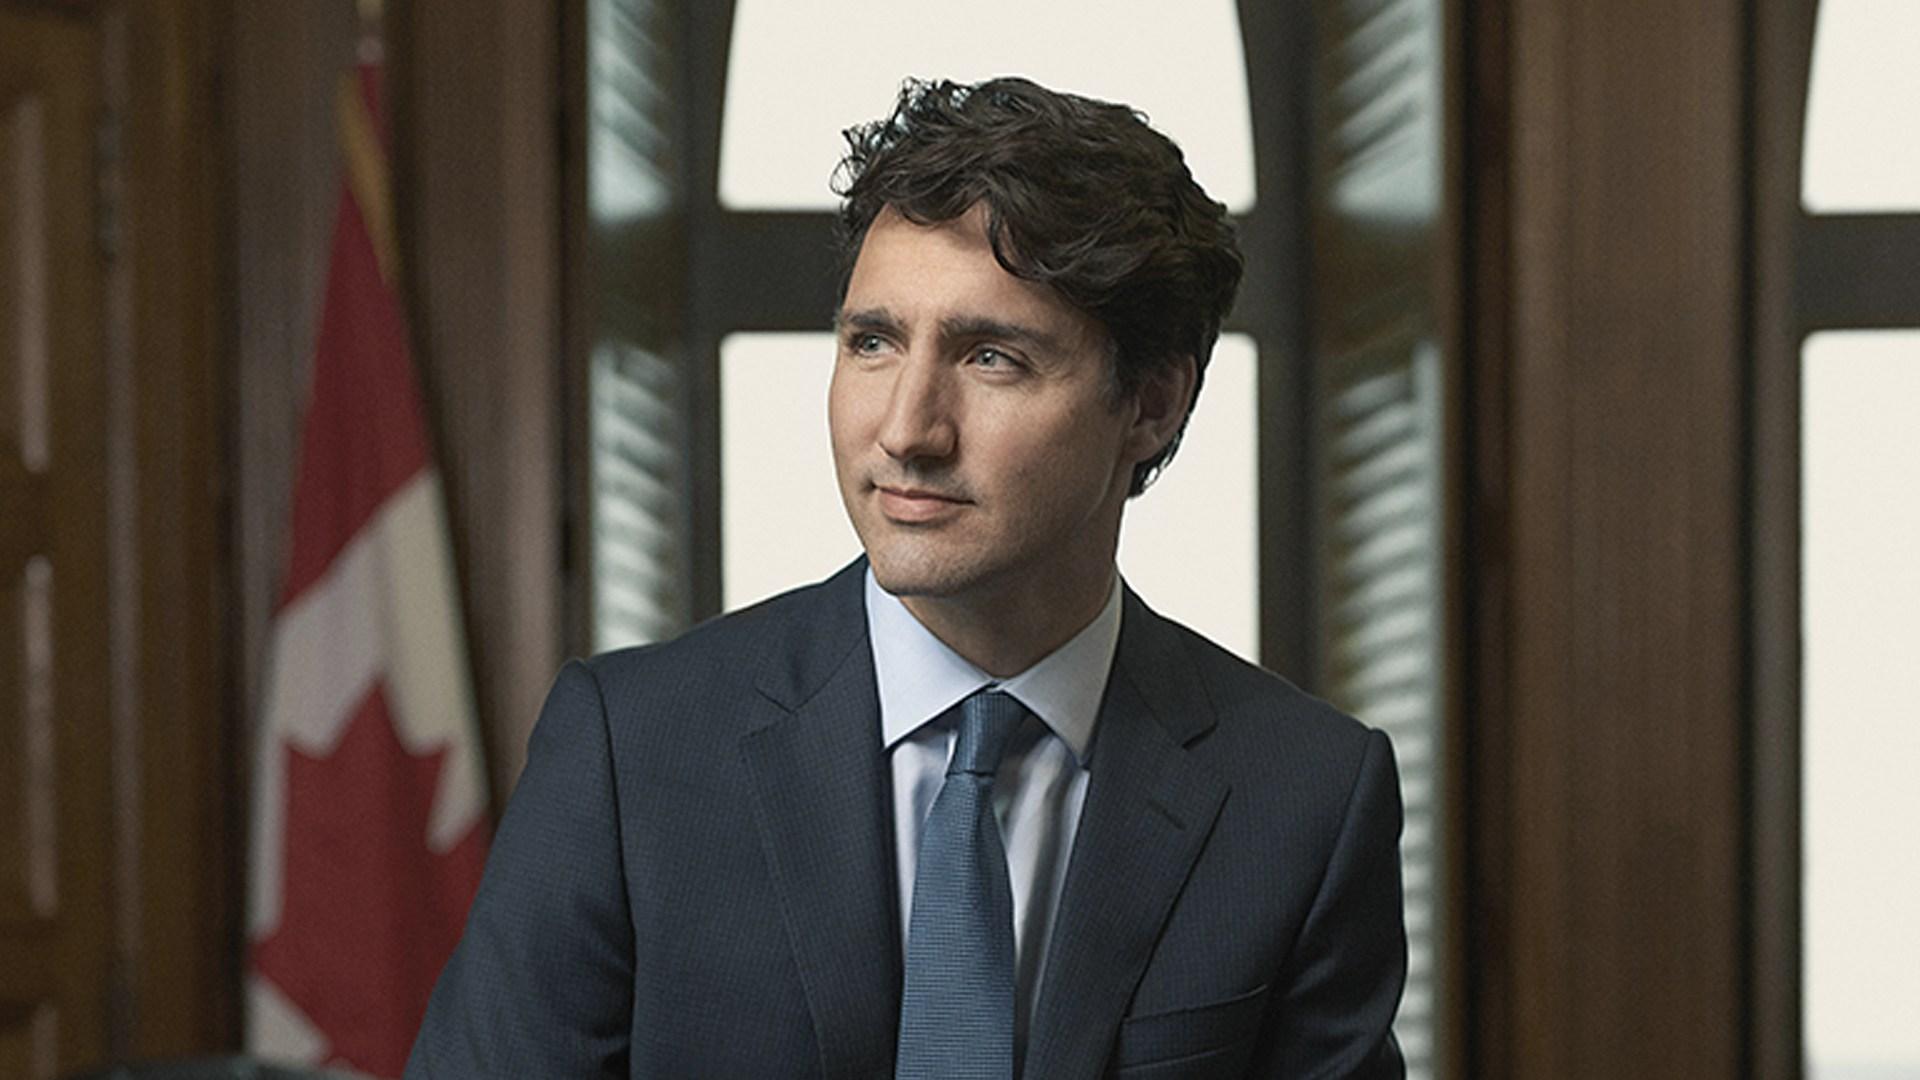 Aranceles son insultantes e inaceptables: Trudeau